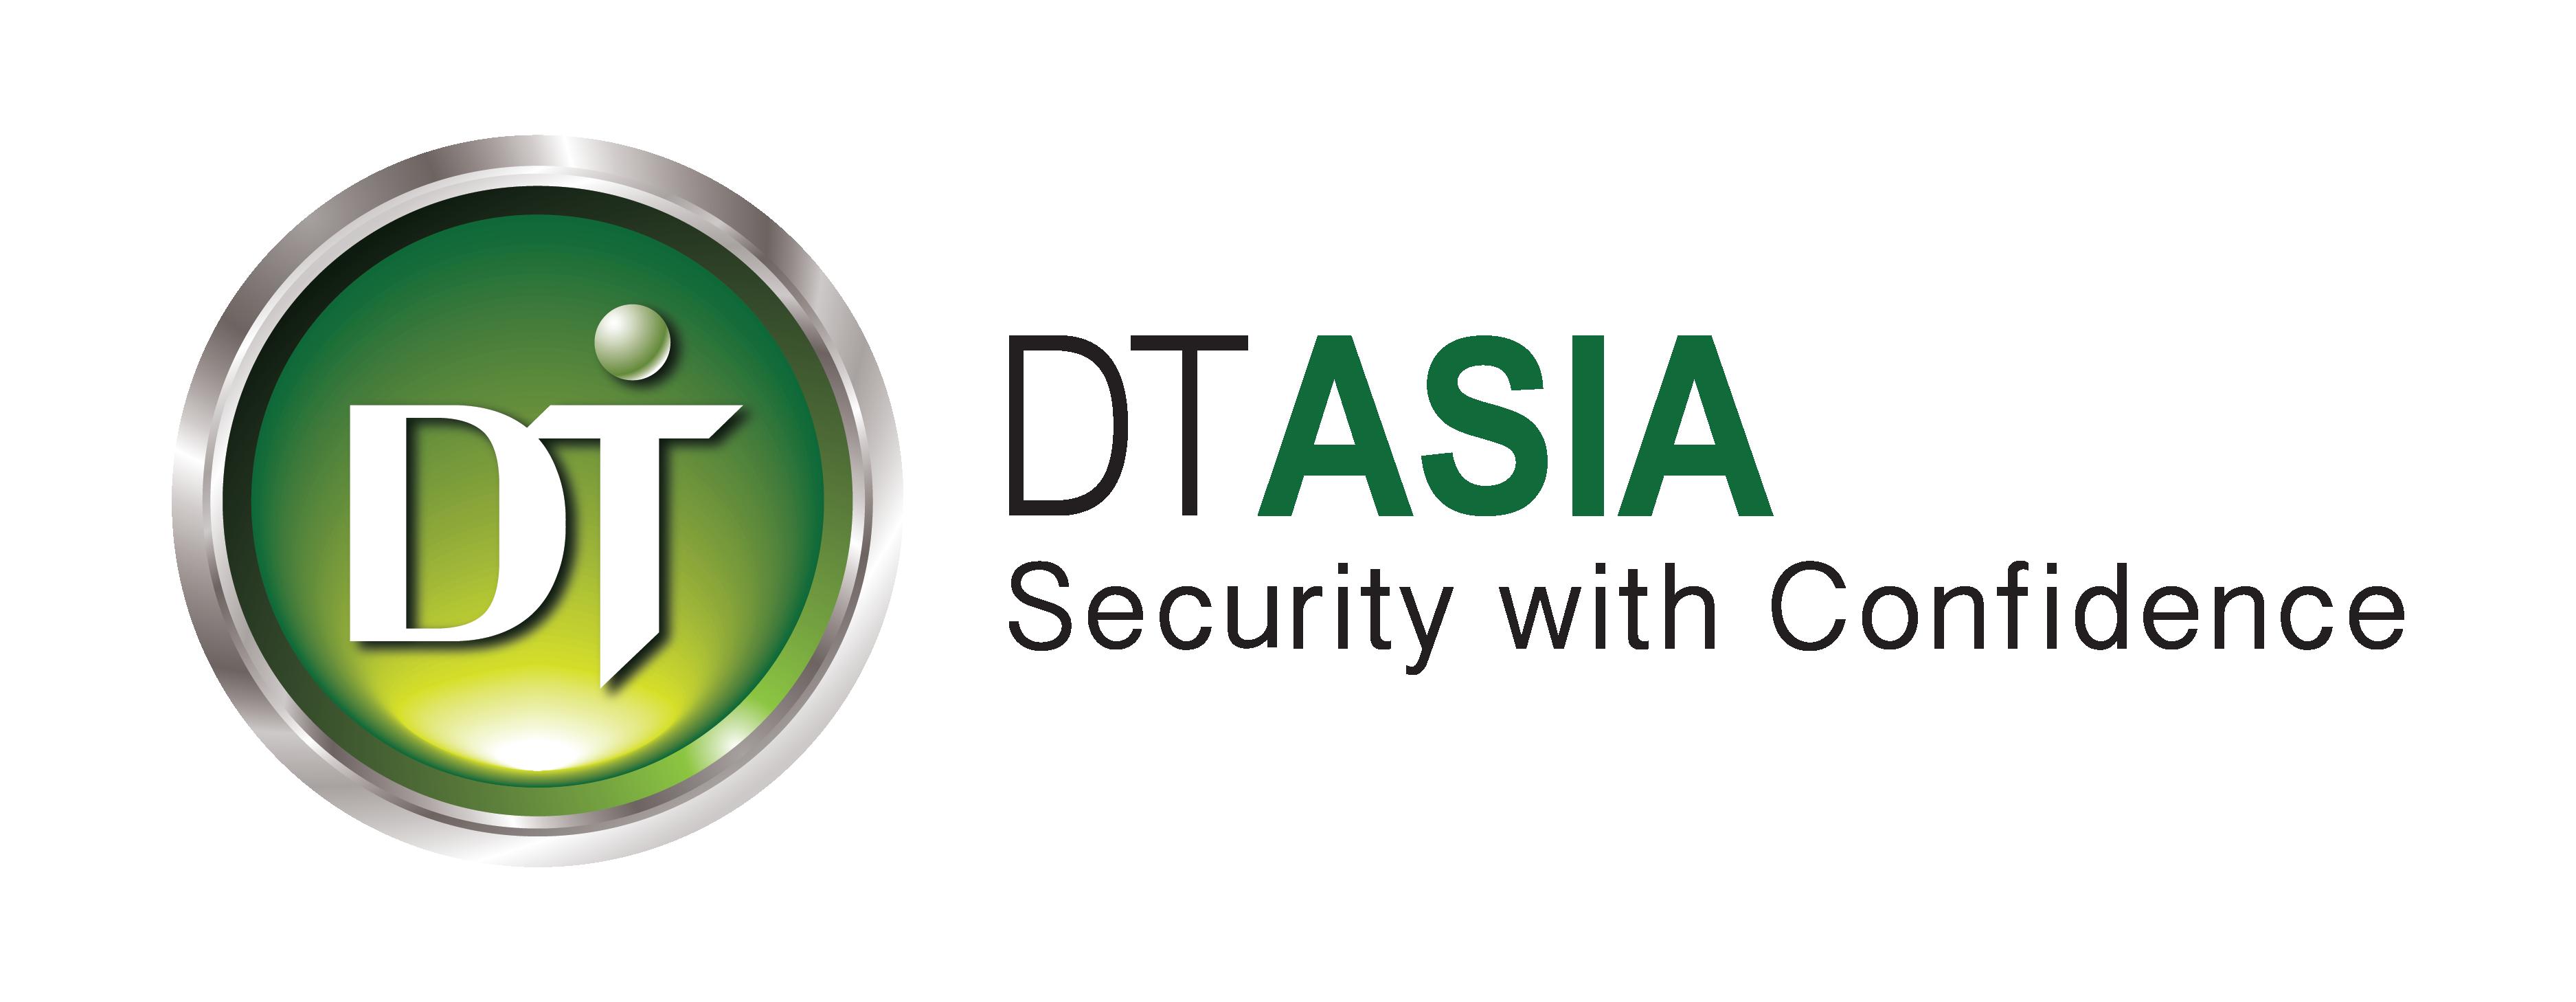 DT Asia